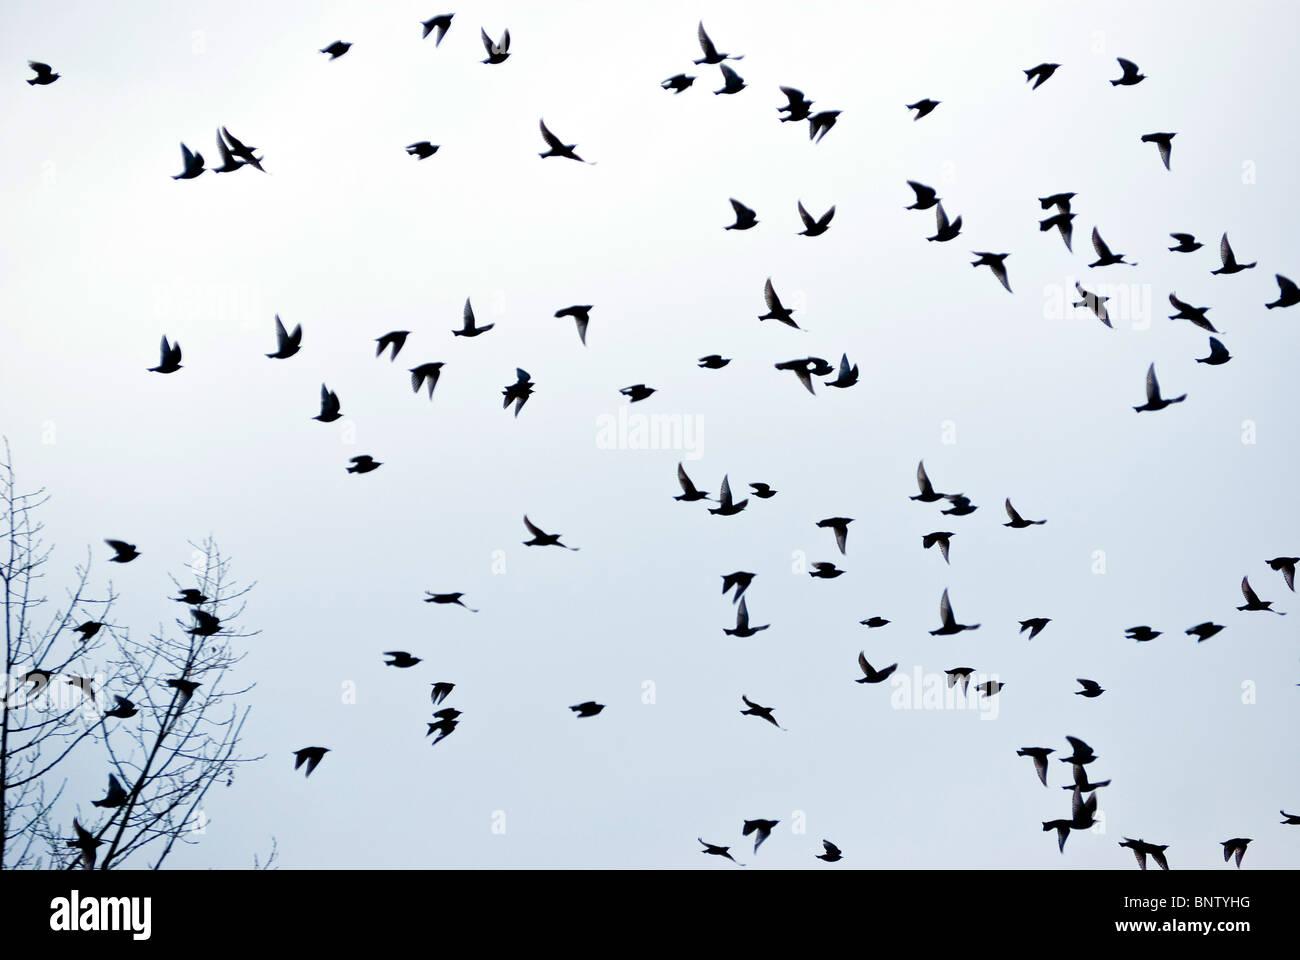 Vogelschwarm im Flug. Stockbild